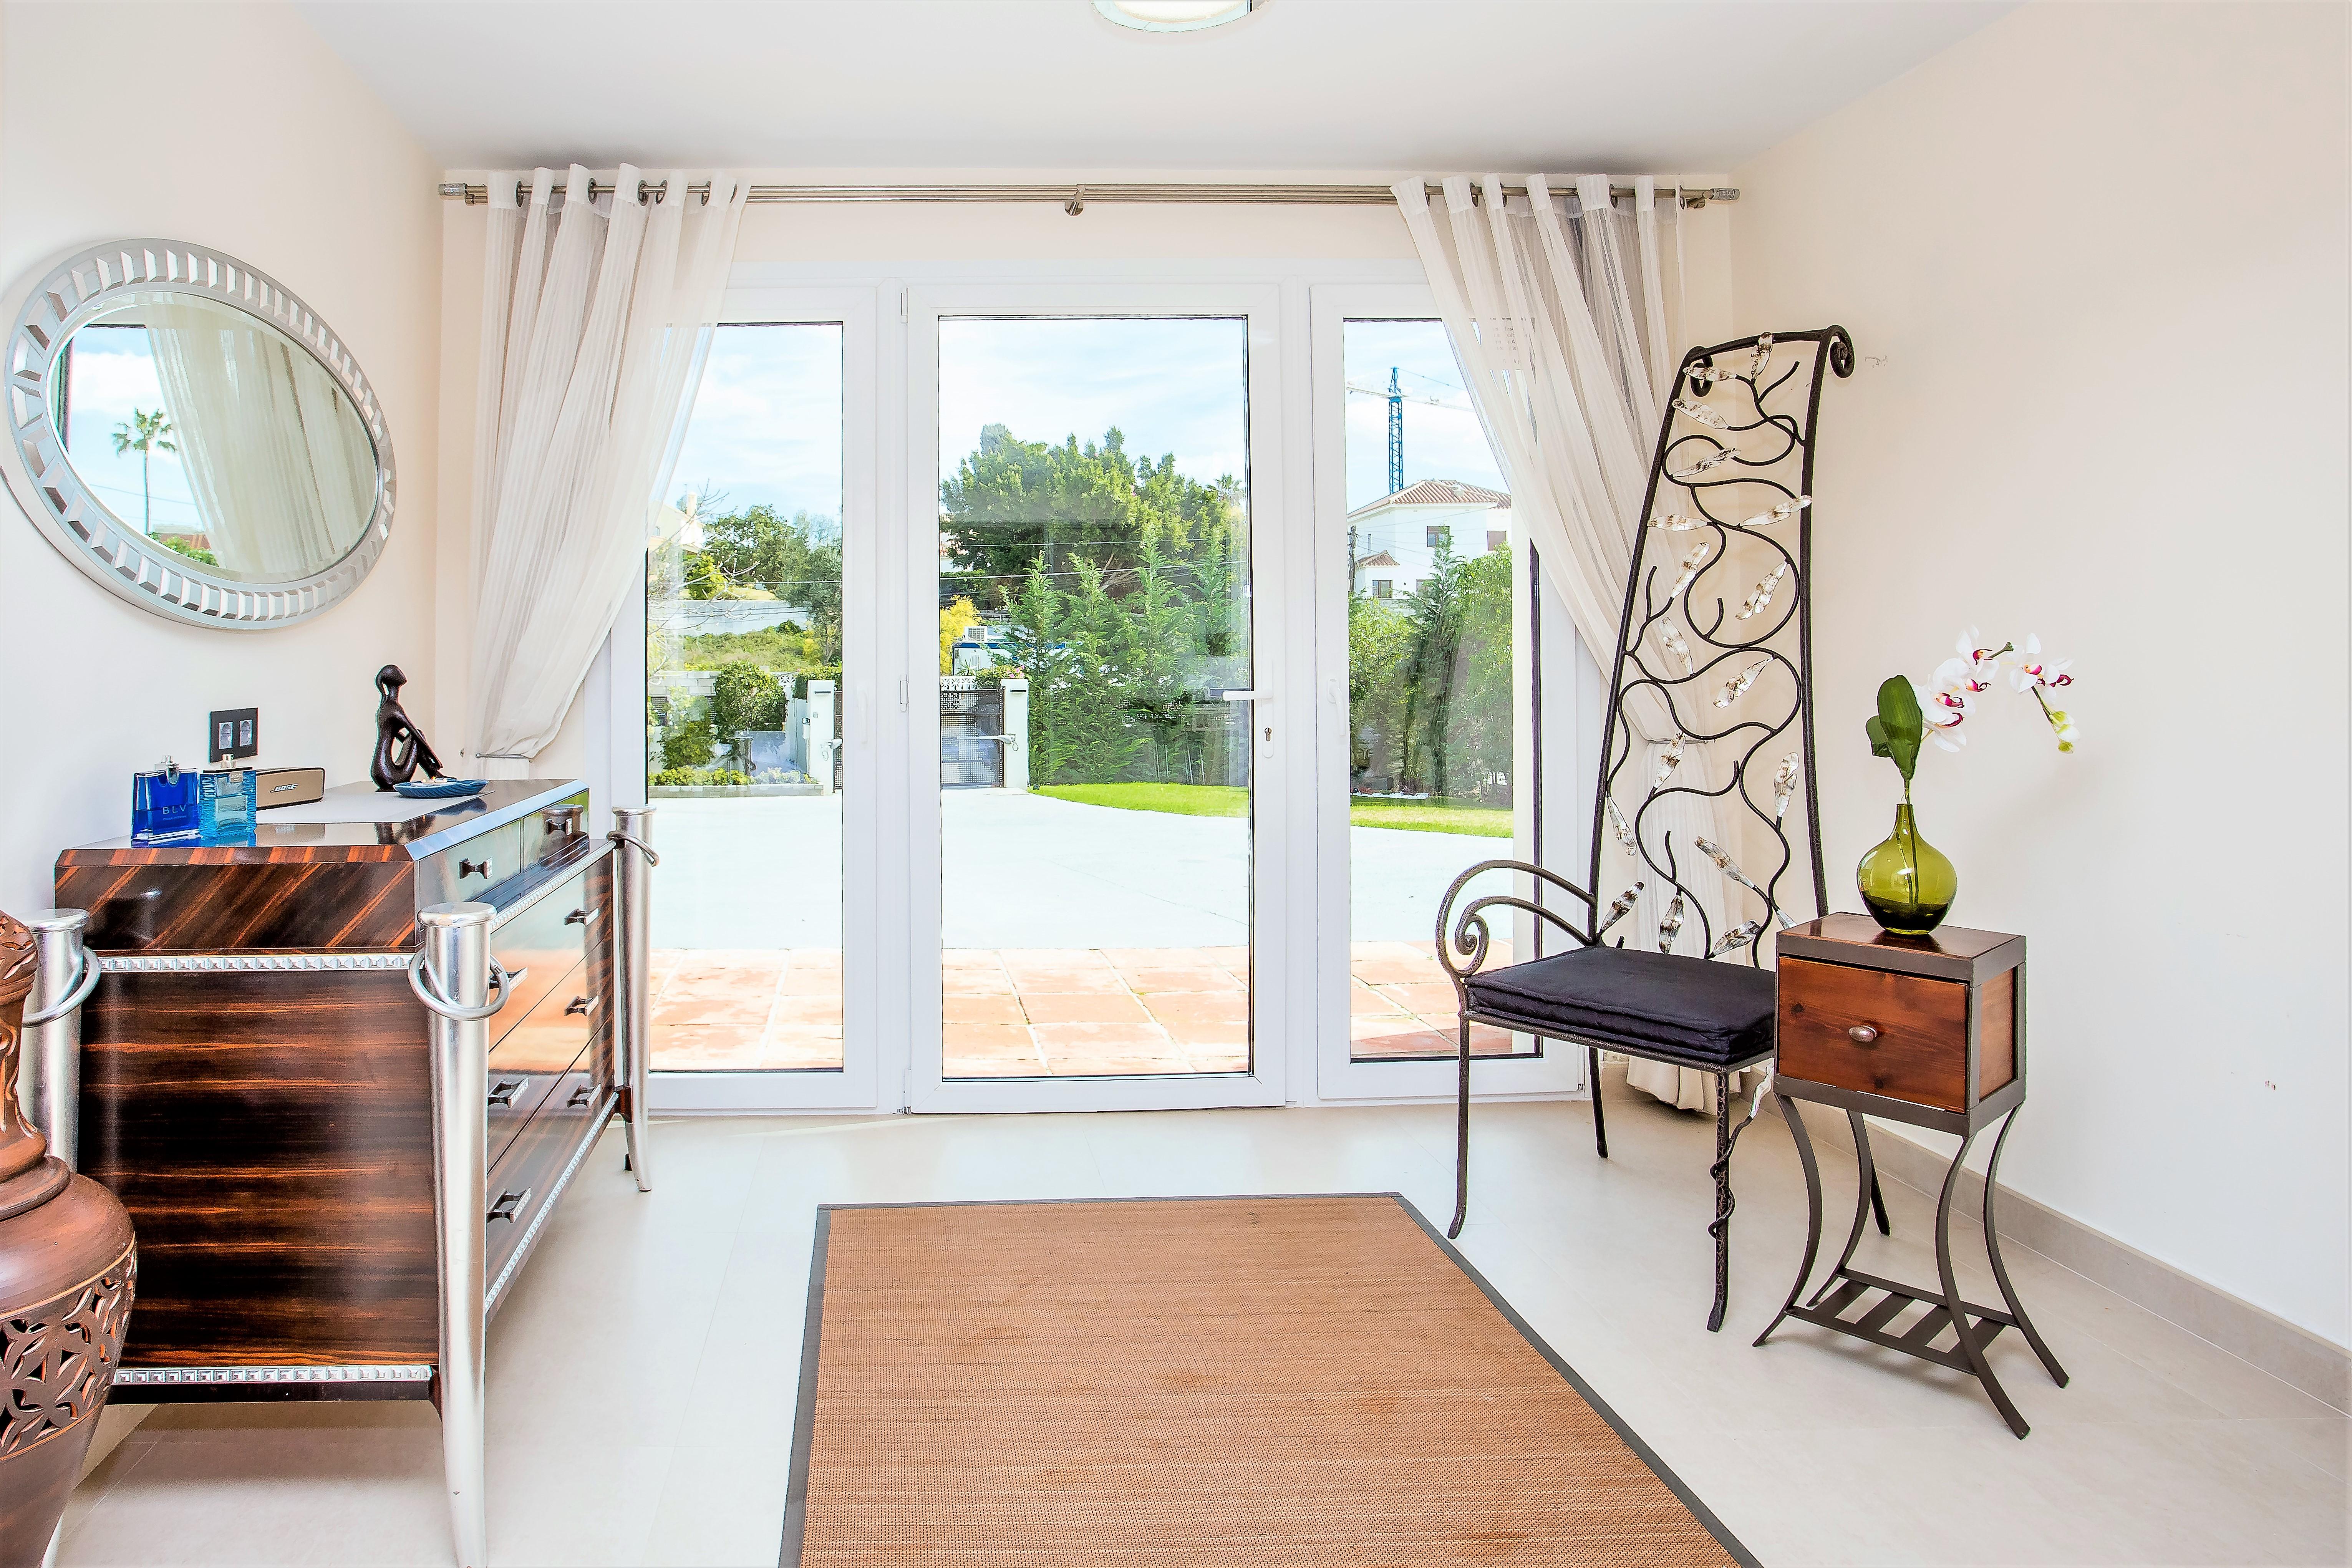 Apartment 4 B R  VILLA by Puerto Banus   Sea 5 m                                photo 20341544